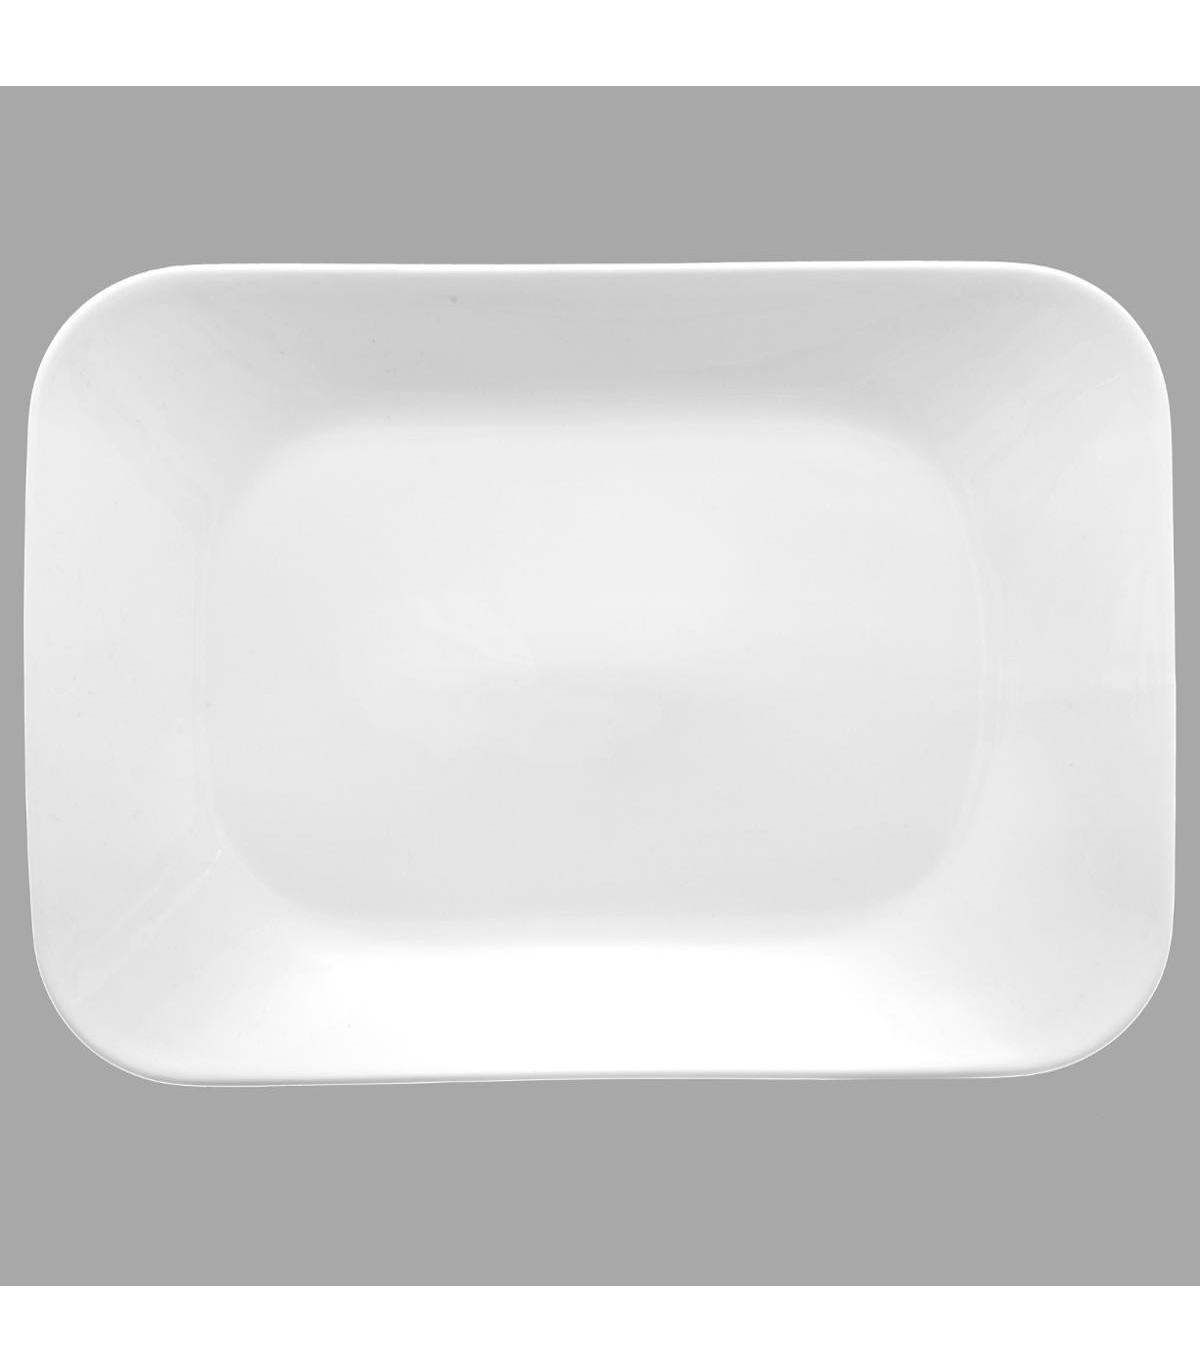 Assiette plate RECT ELEGANCE 29X20